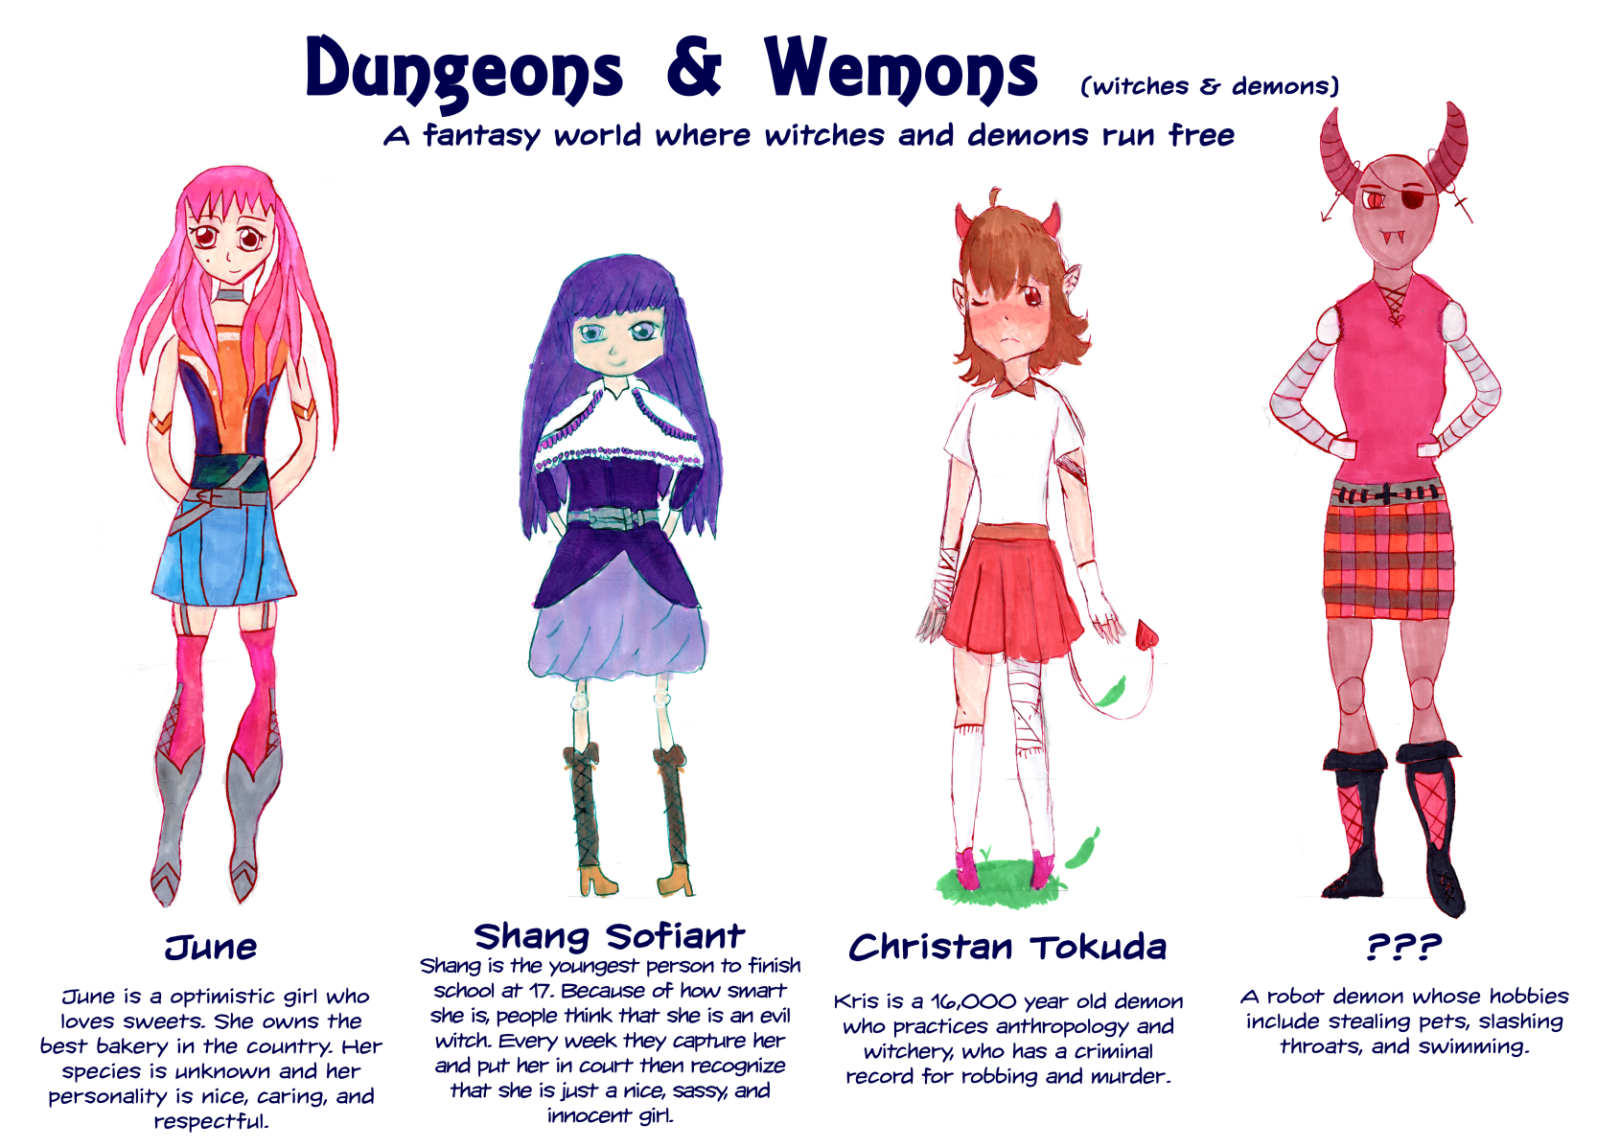 Demons & Wemons comic characters